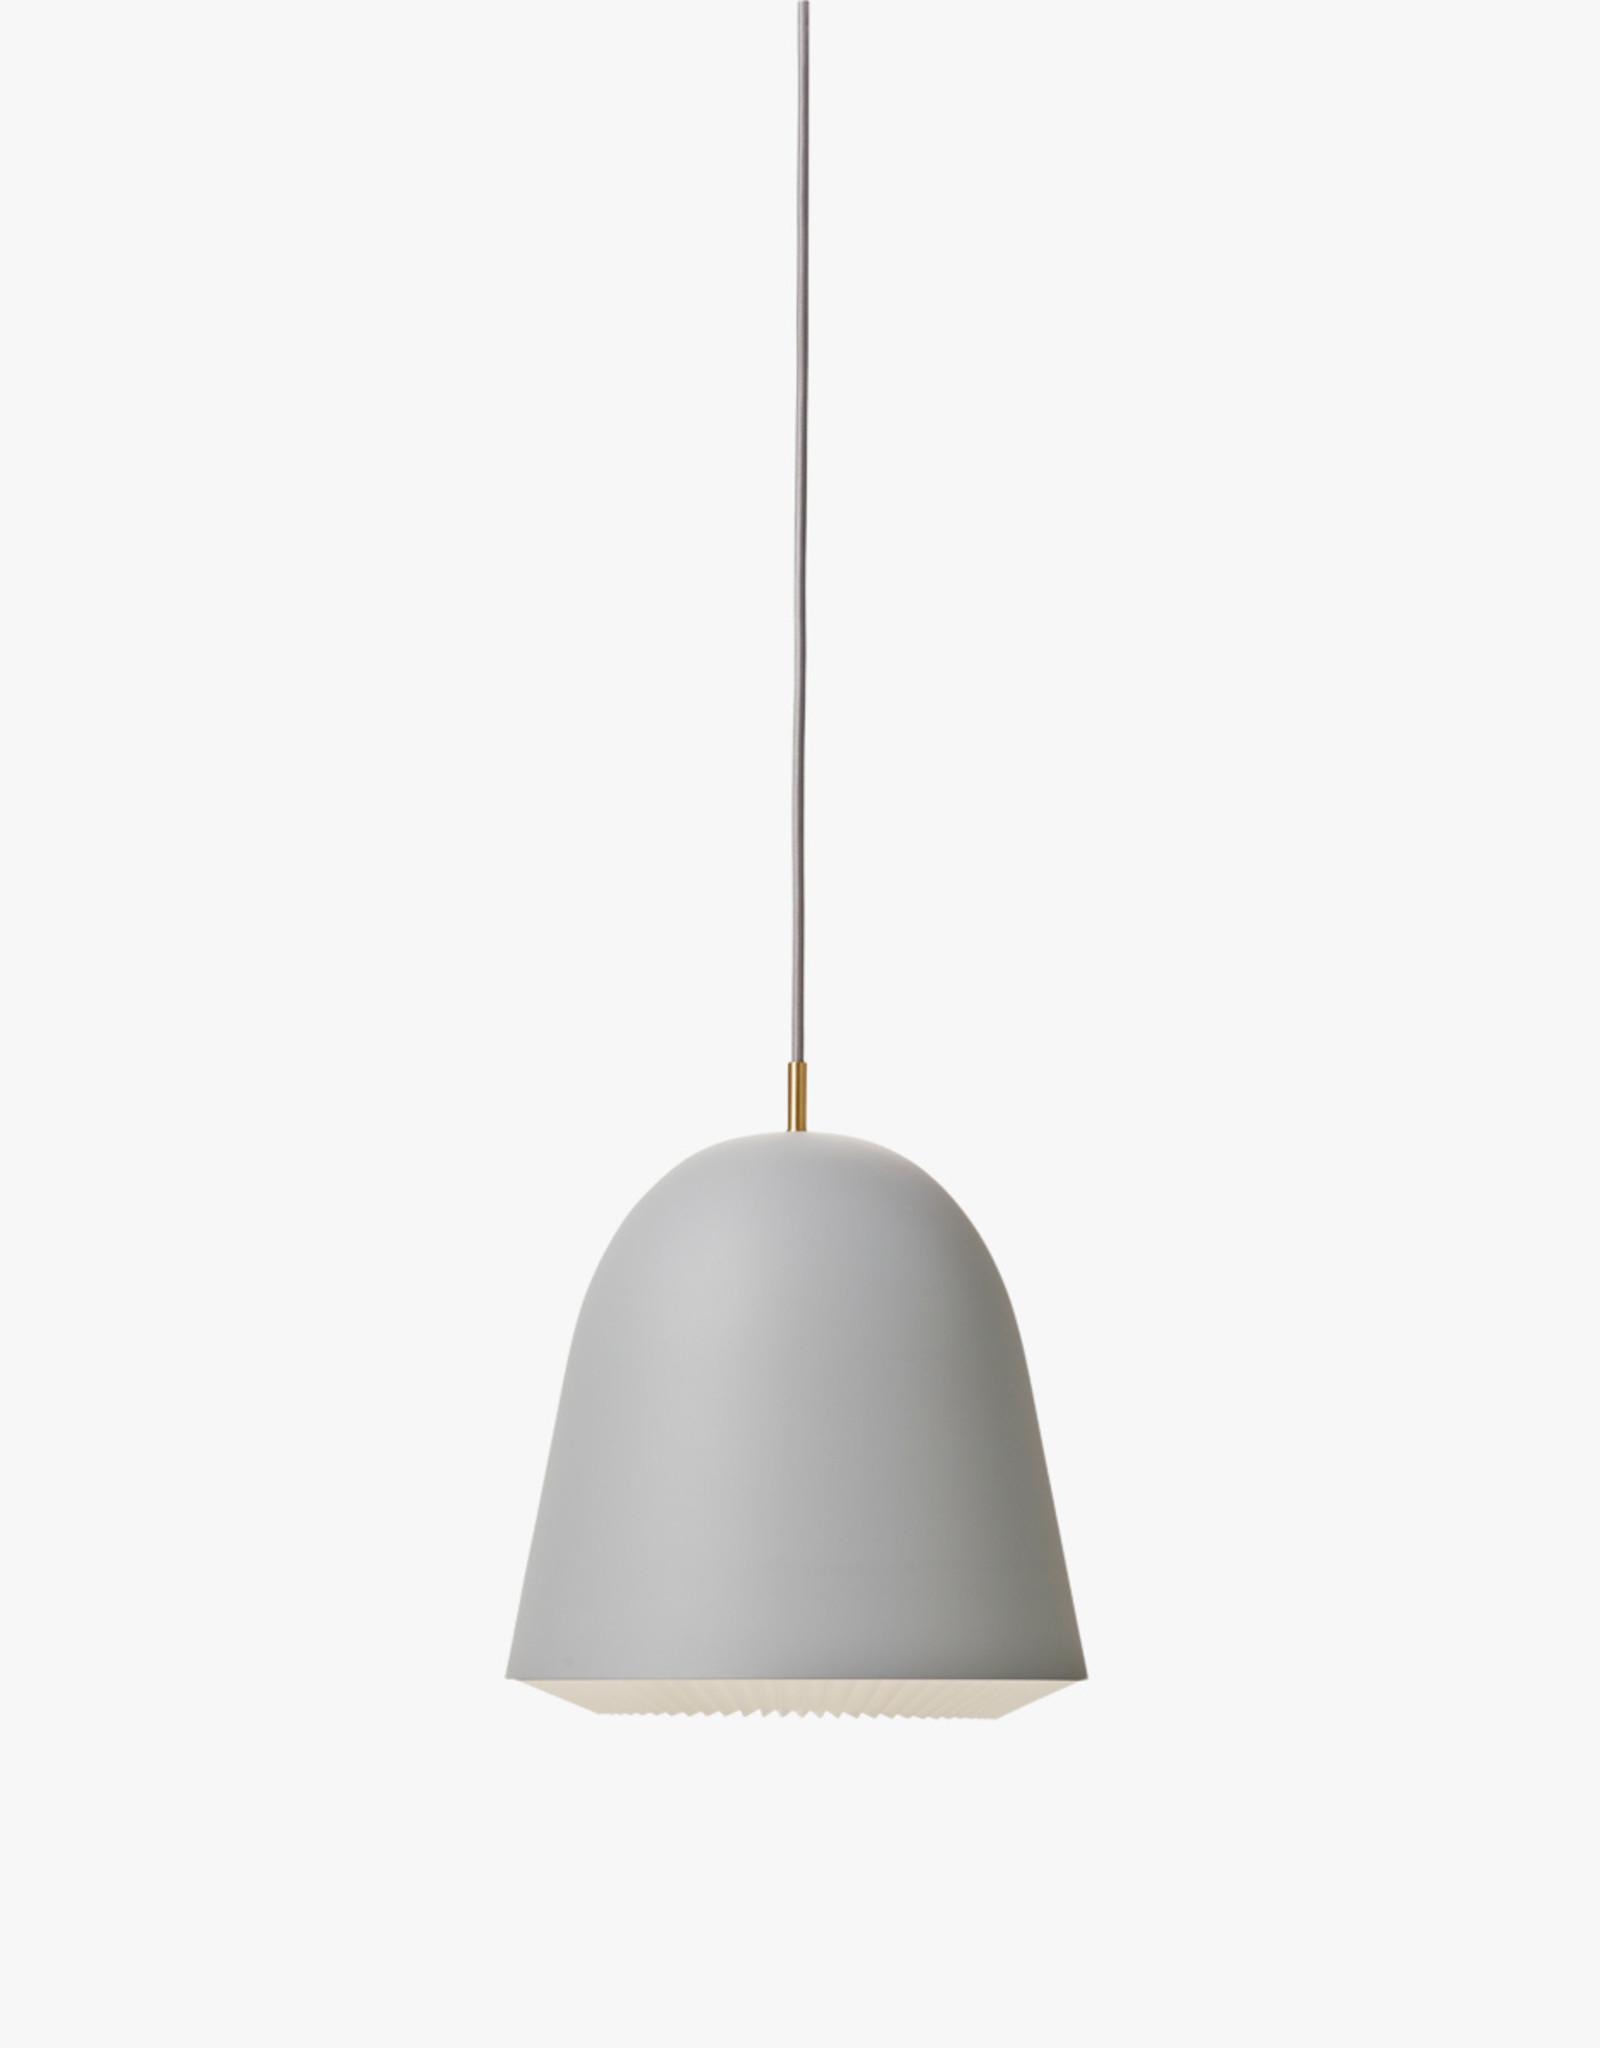 Caché pendant light by Aurelién Barbry | Grey | S | W20cm x H21cm | 1x E27 600 LM max. 20W LED bulb required